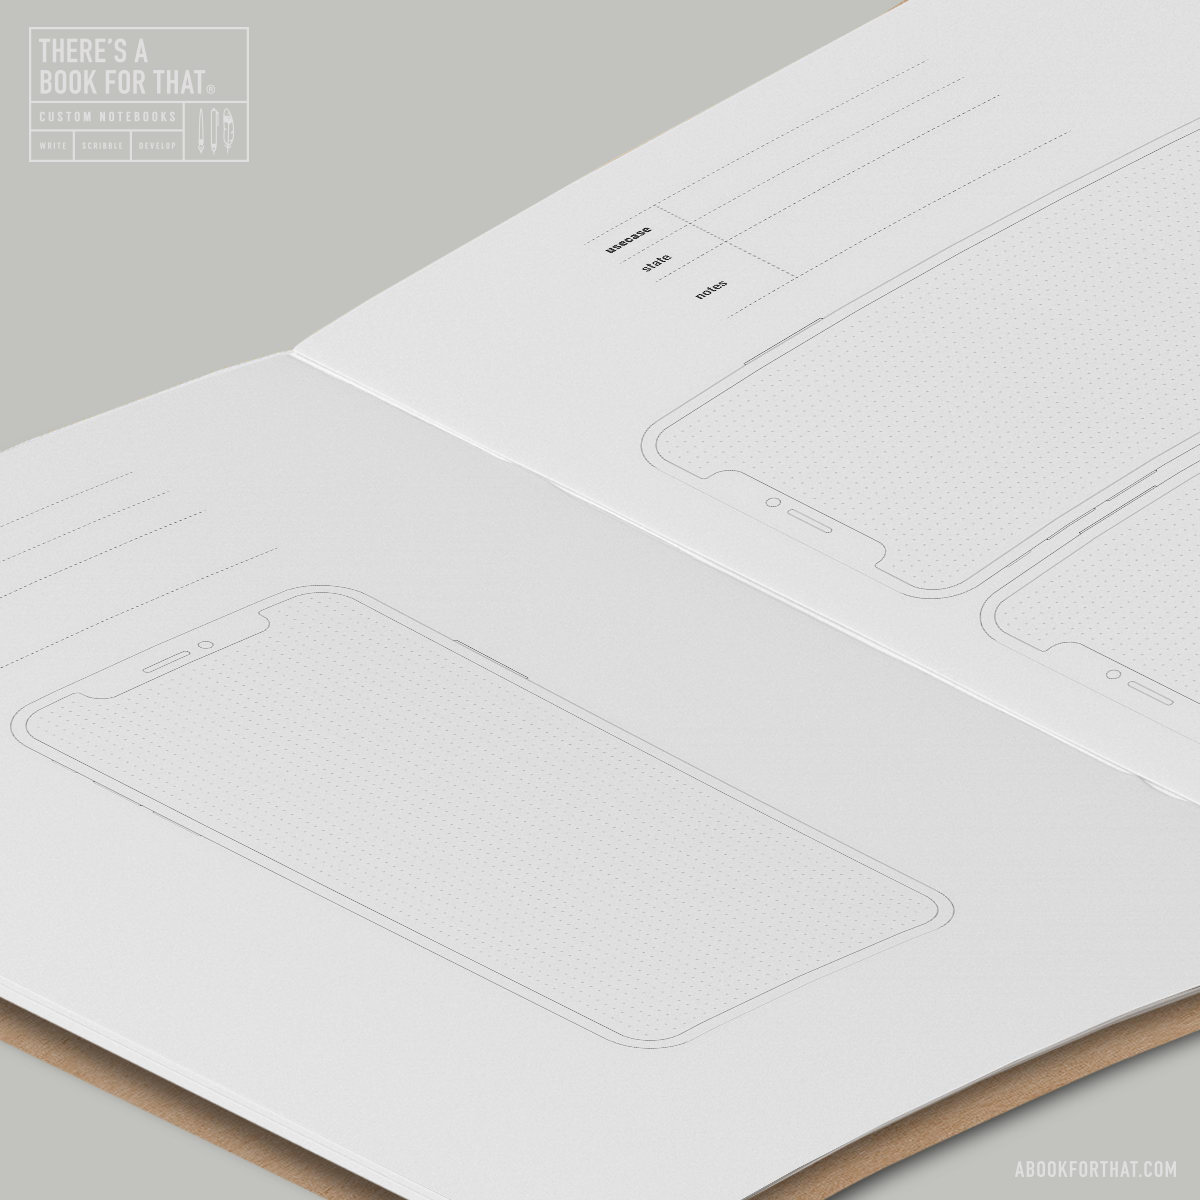 B-115_App-Mockup-Notebook_Stationery_Details2